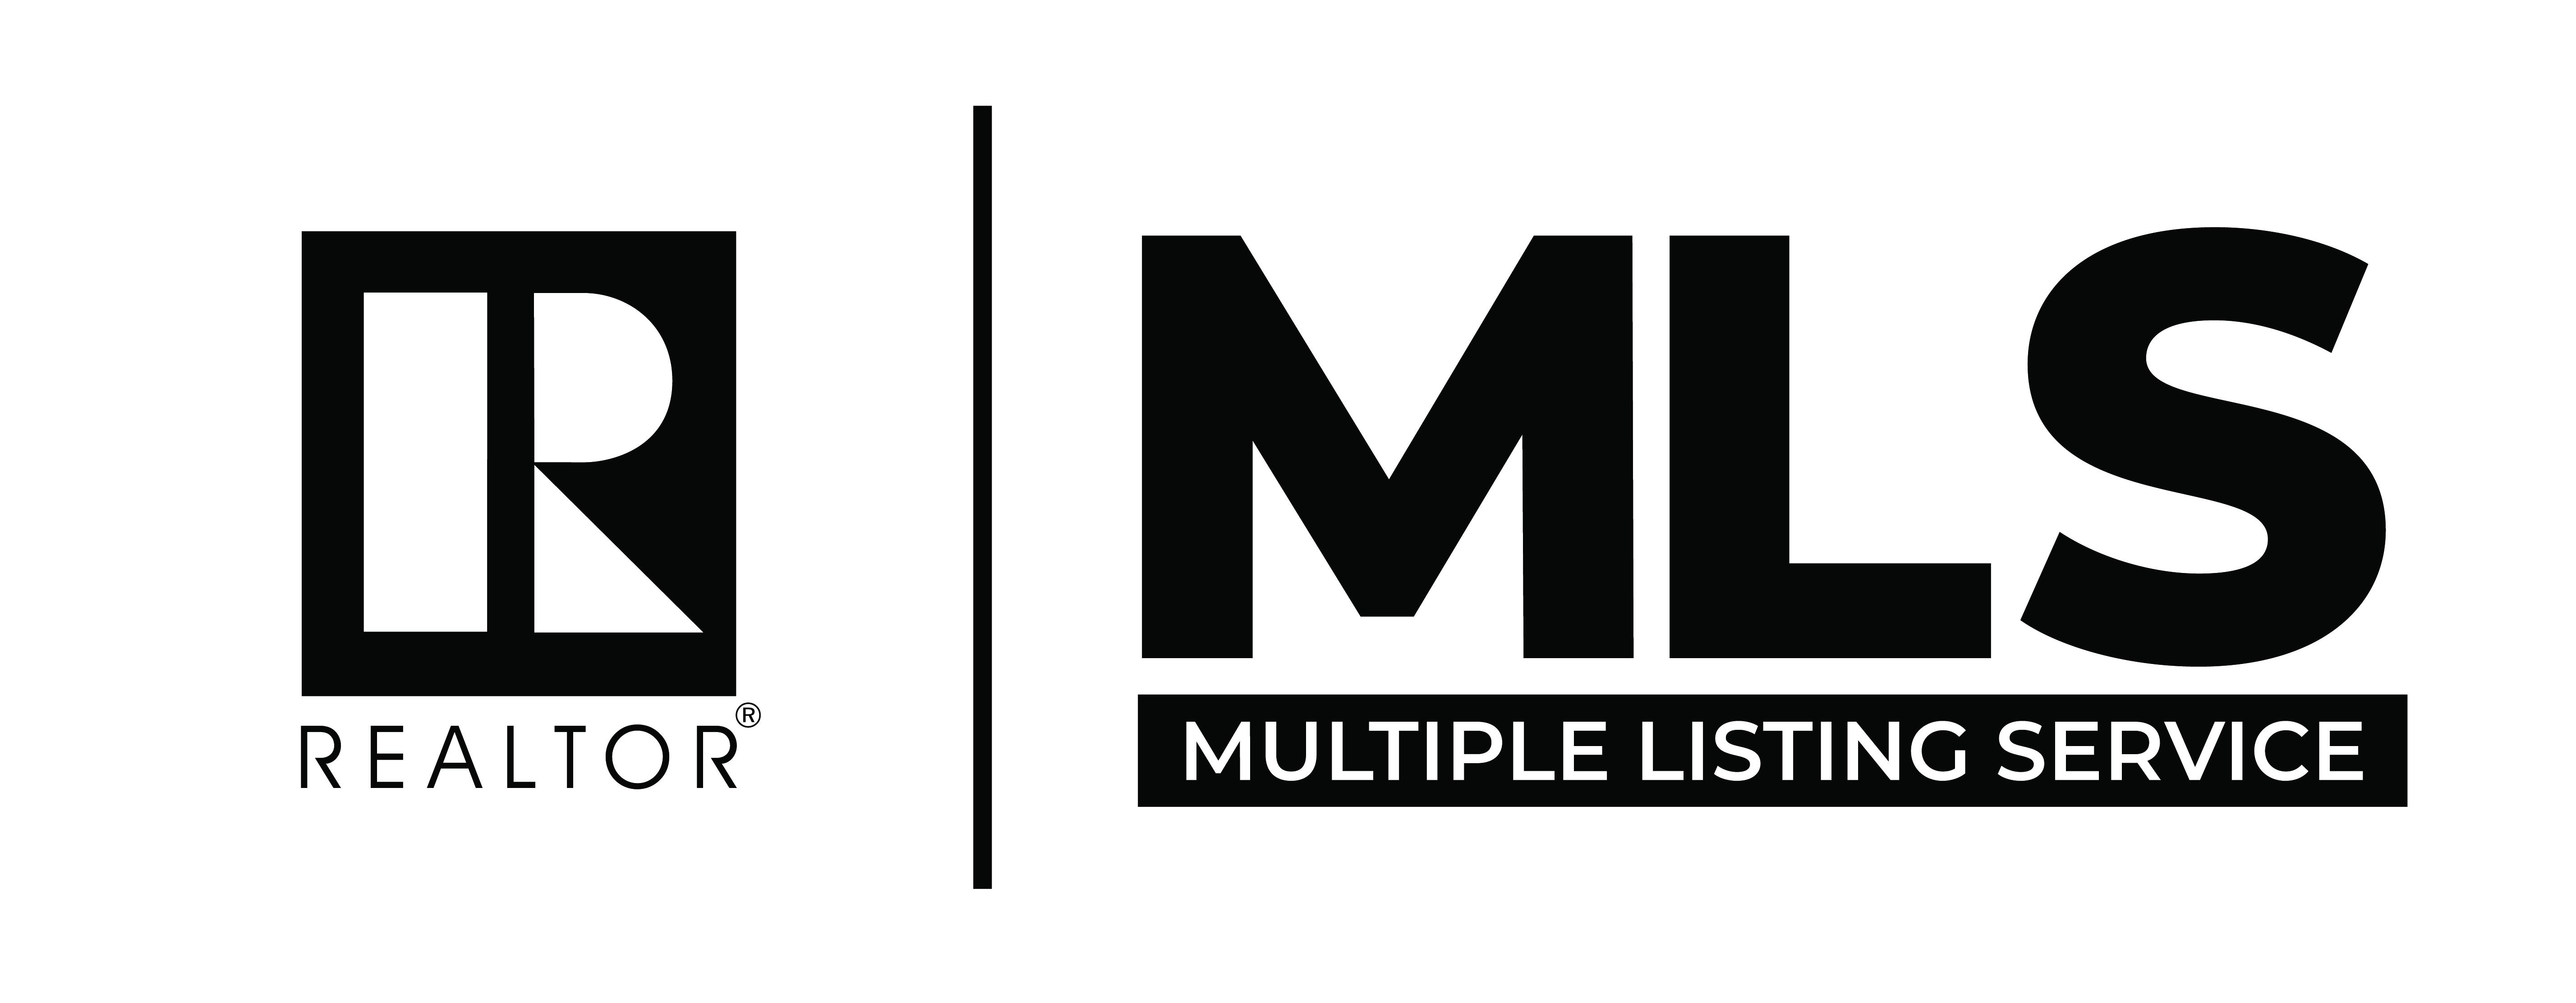 MLS Service Mark Logo